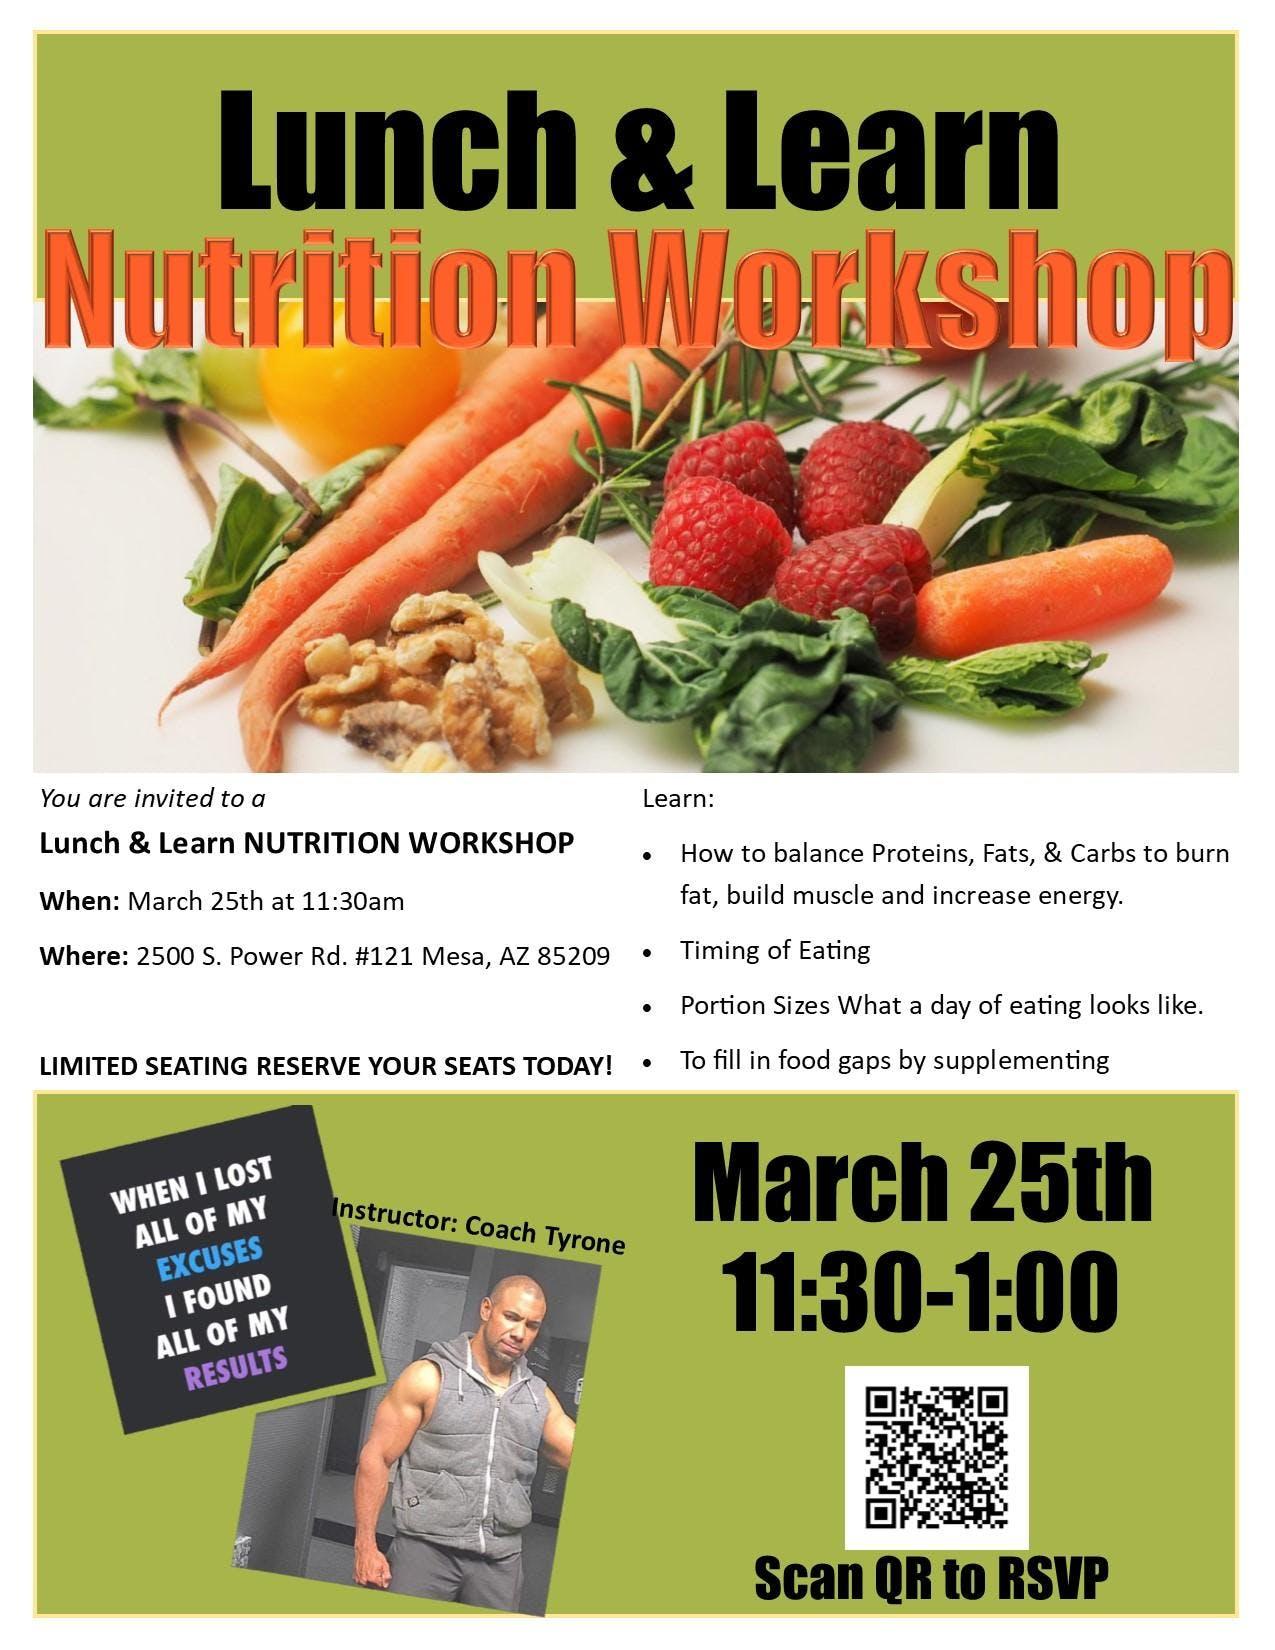 Coach Tyrone's Nutrition Workshop